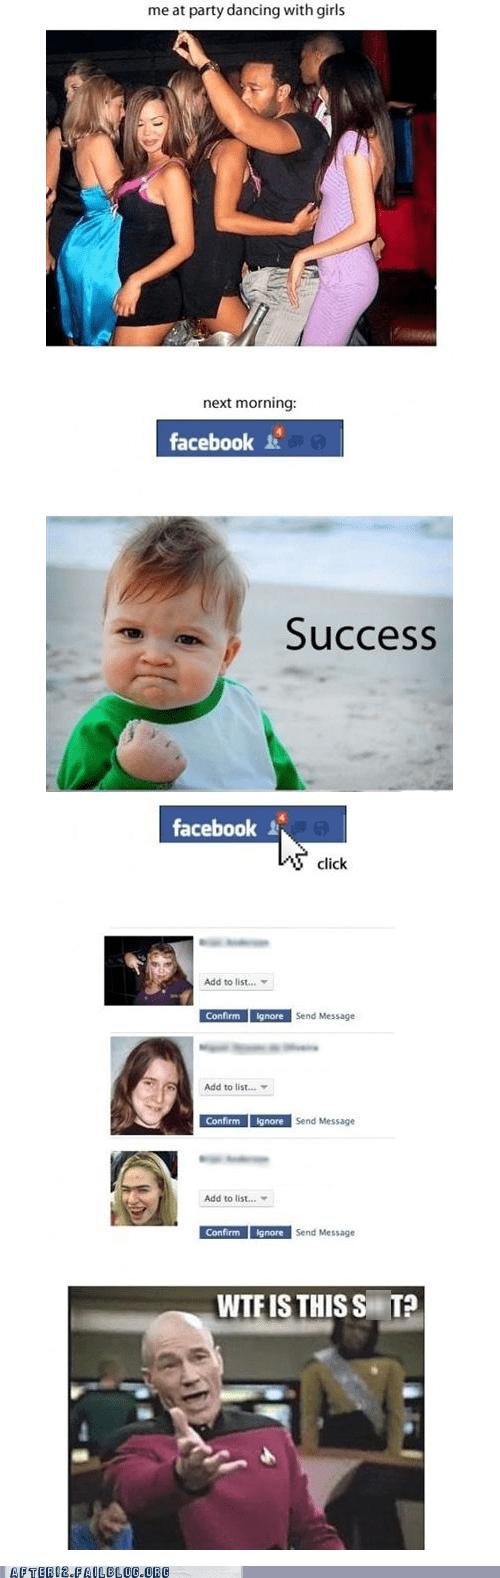 facebook partying success kid - 6227646976